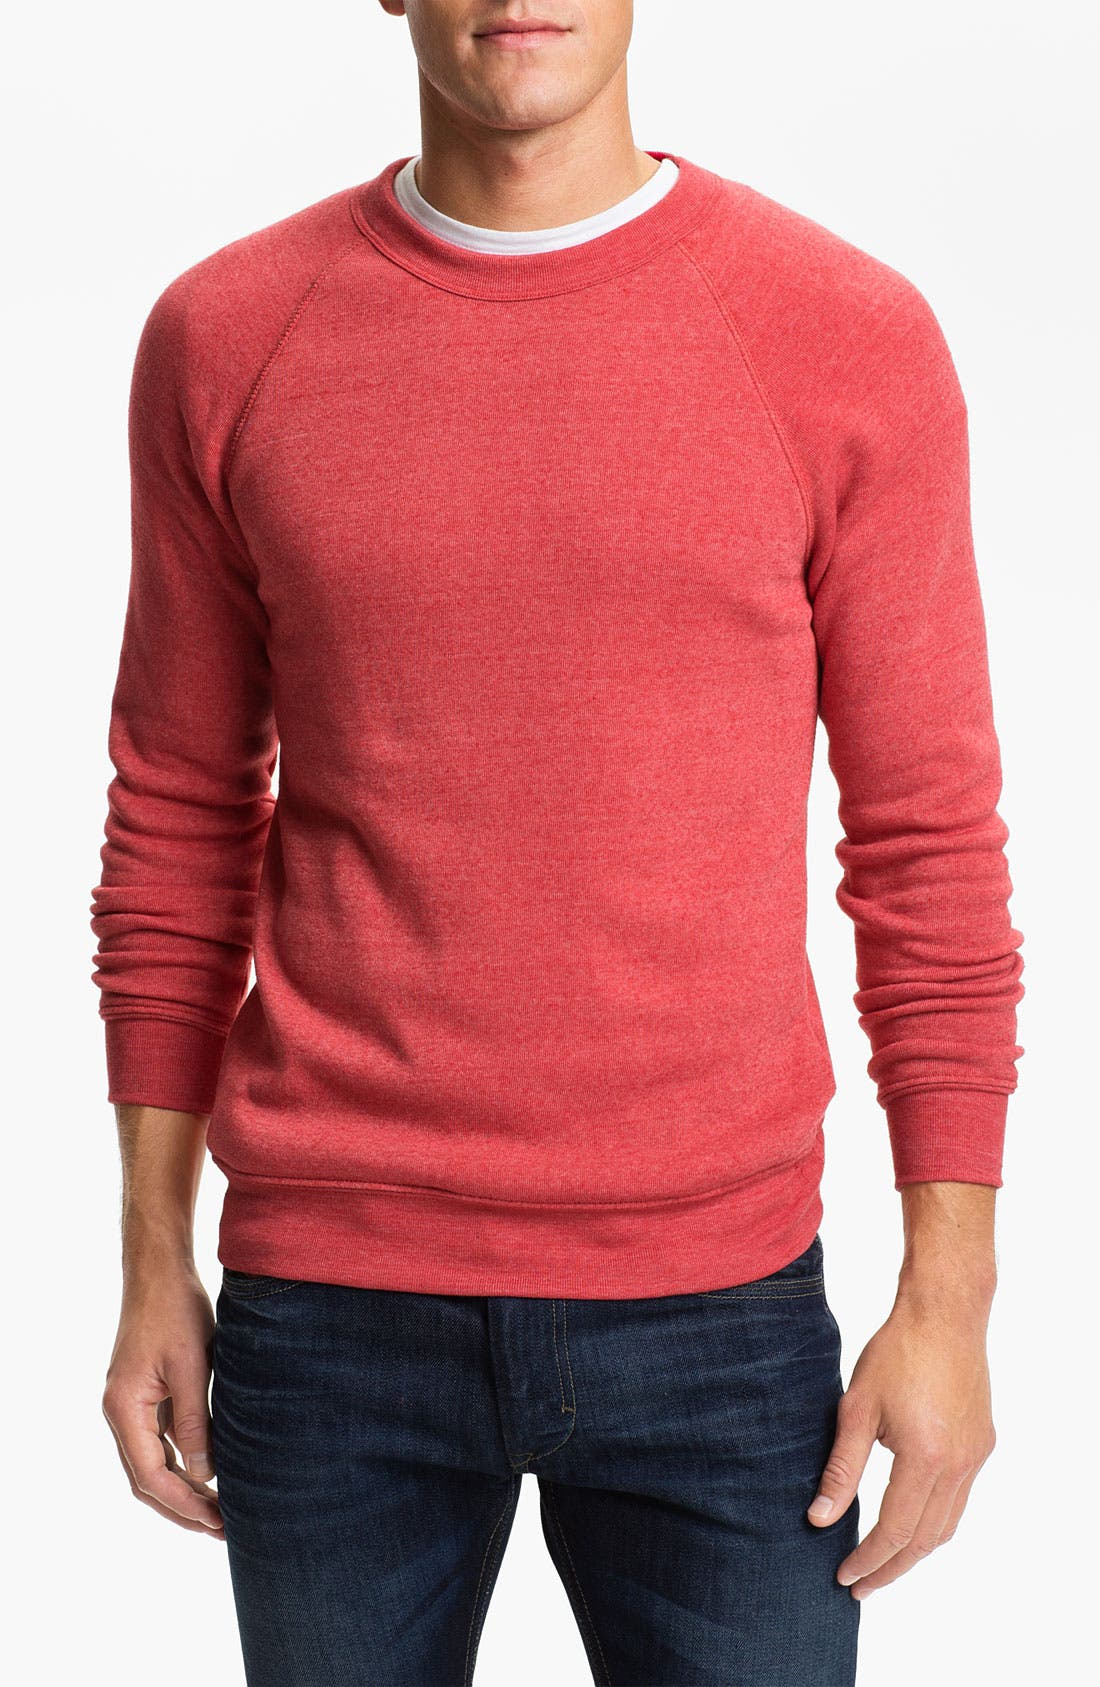 Main Image - Alternative 'The Champ' Sweatshirt